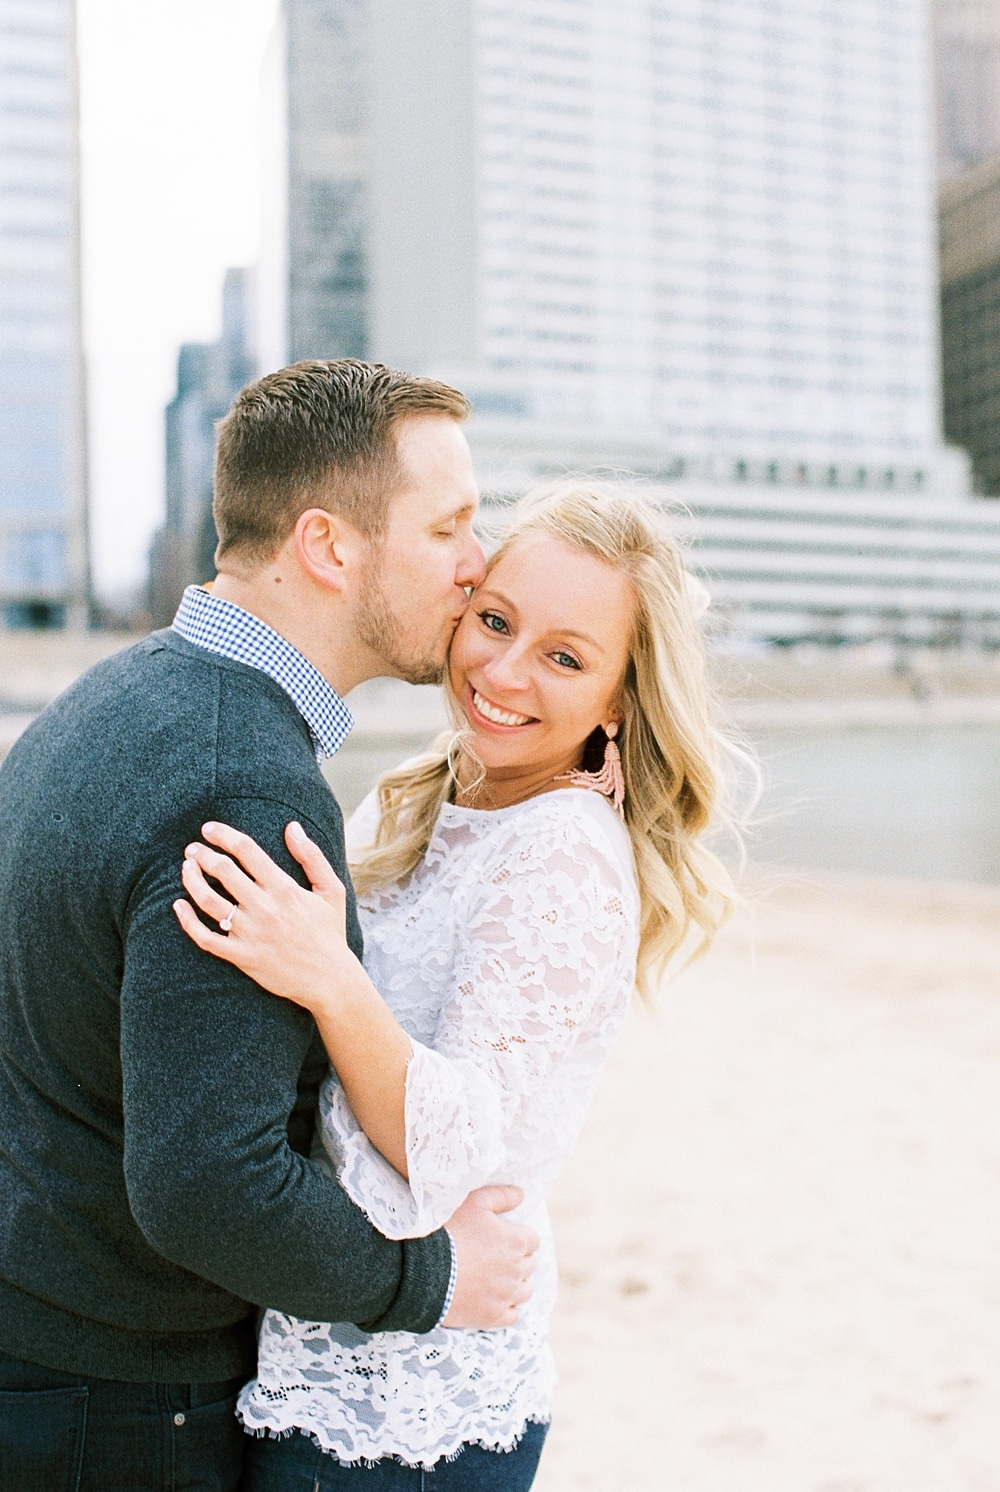 Kristin-La-Voie-Photography-Chicago-Wedding-Photographer-70